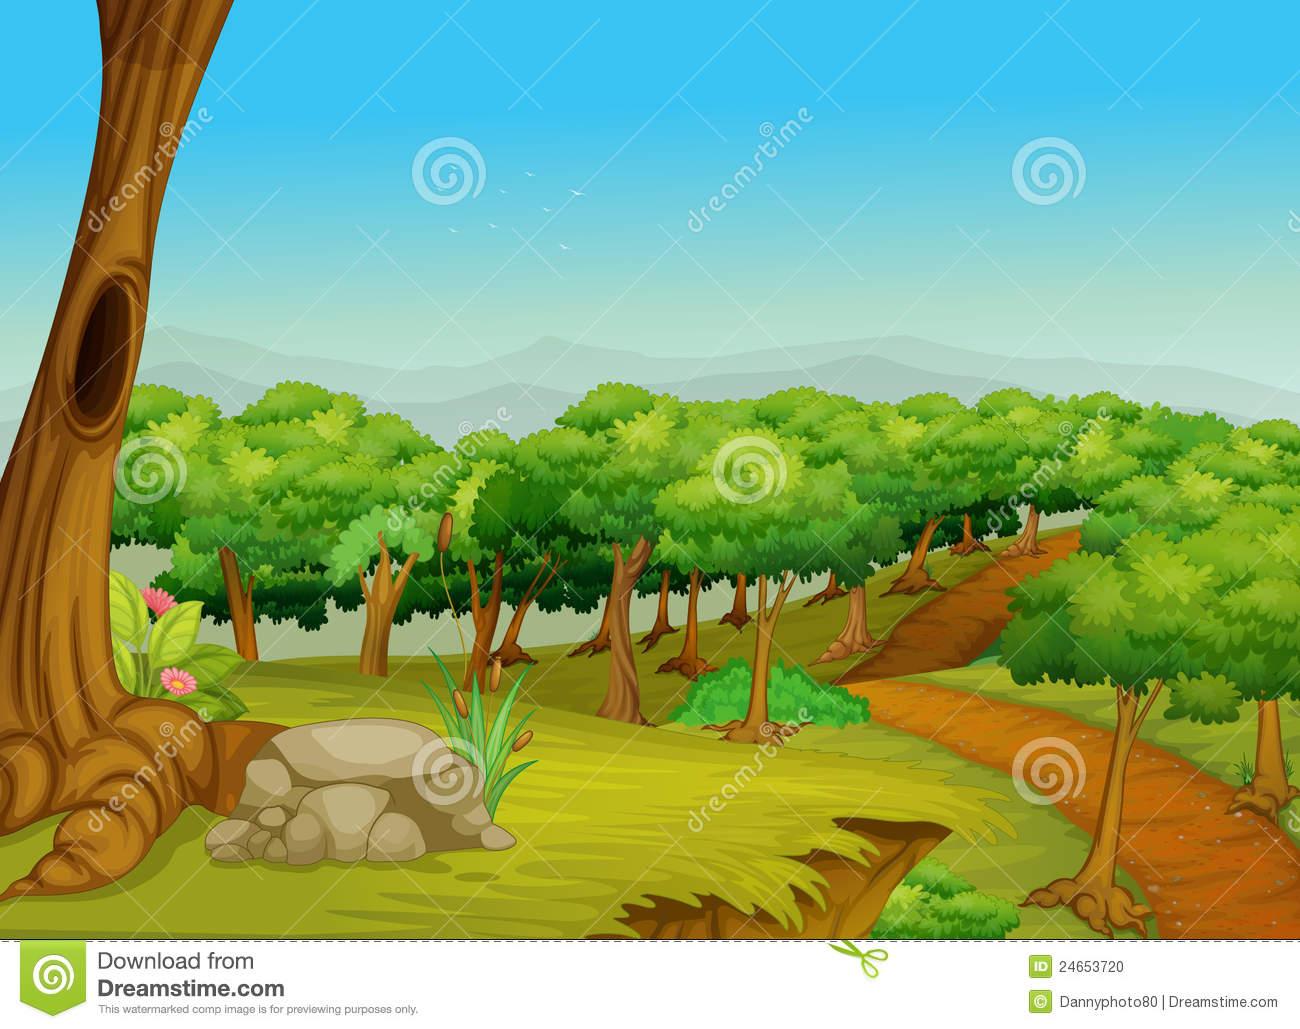 Clip art images panda. Land clipart forest way